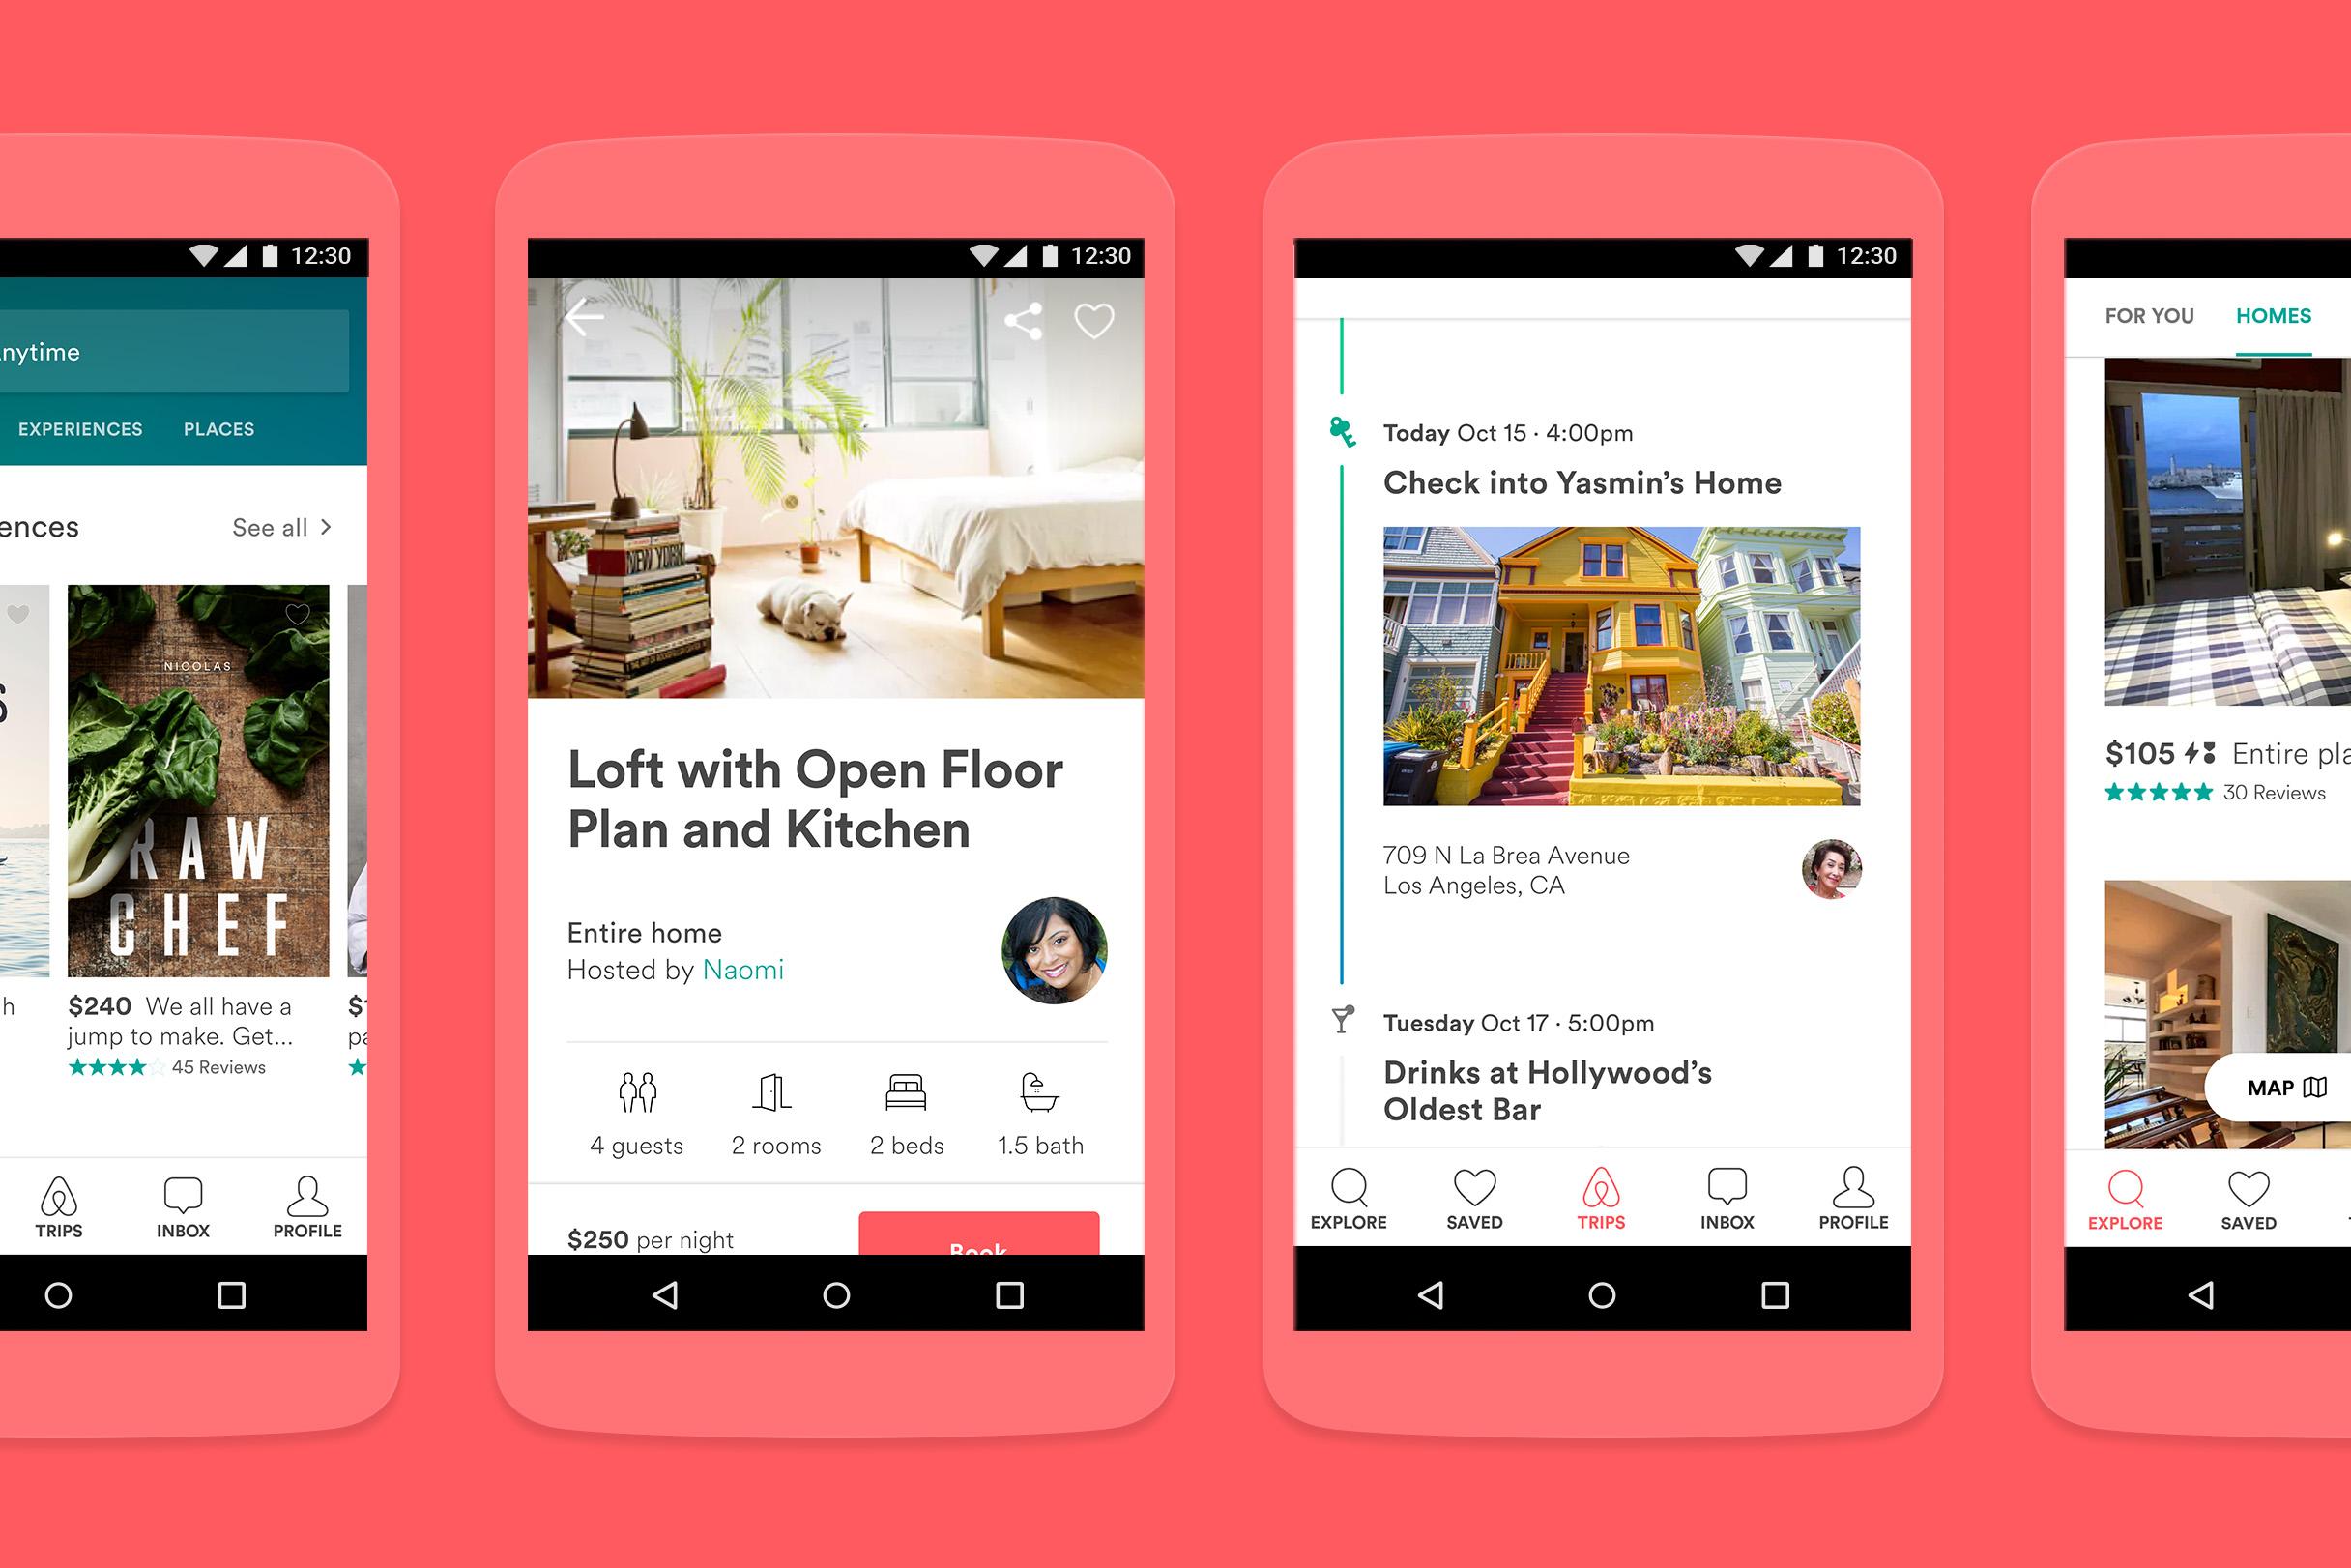 airbnb_3x2.jpg